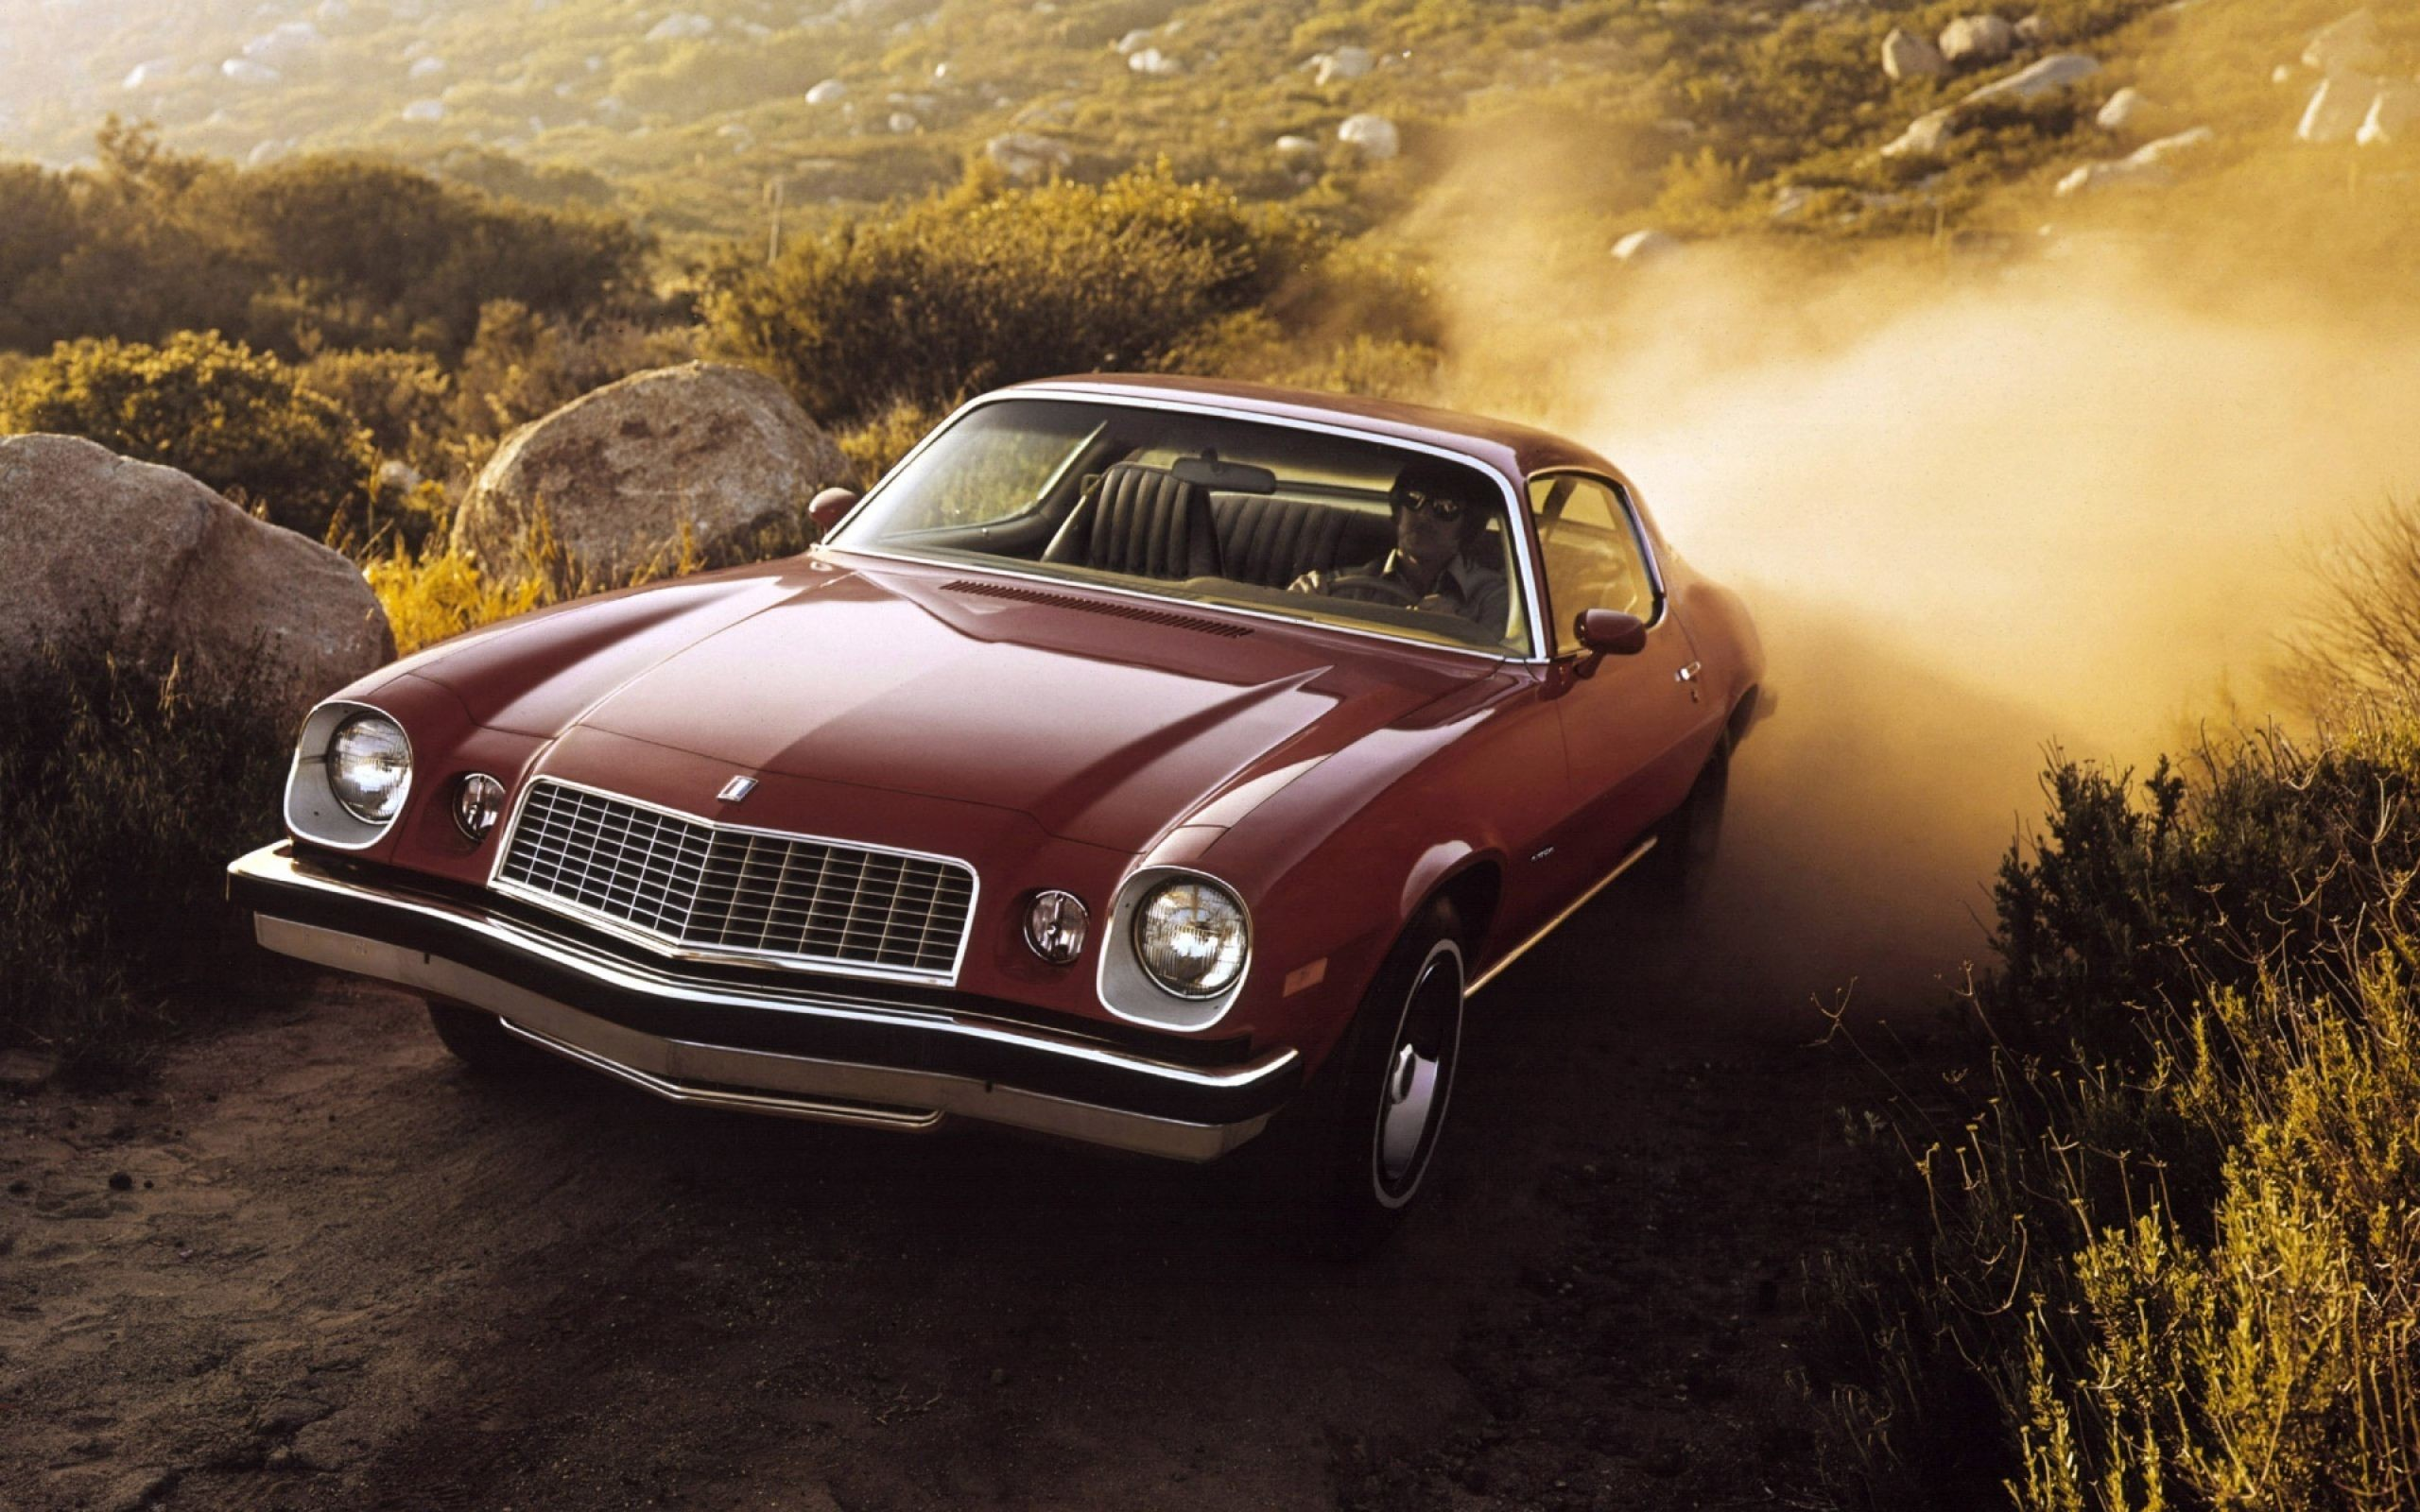 69 Camaro Wallpaper Hd 68 Images